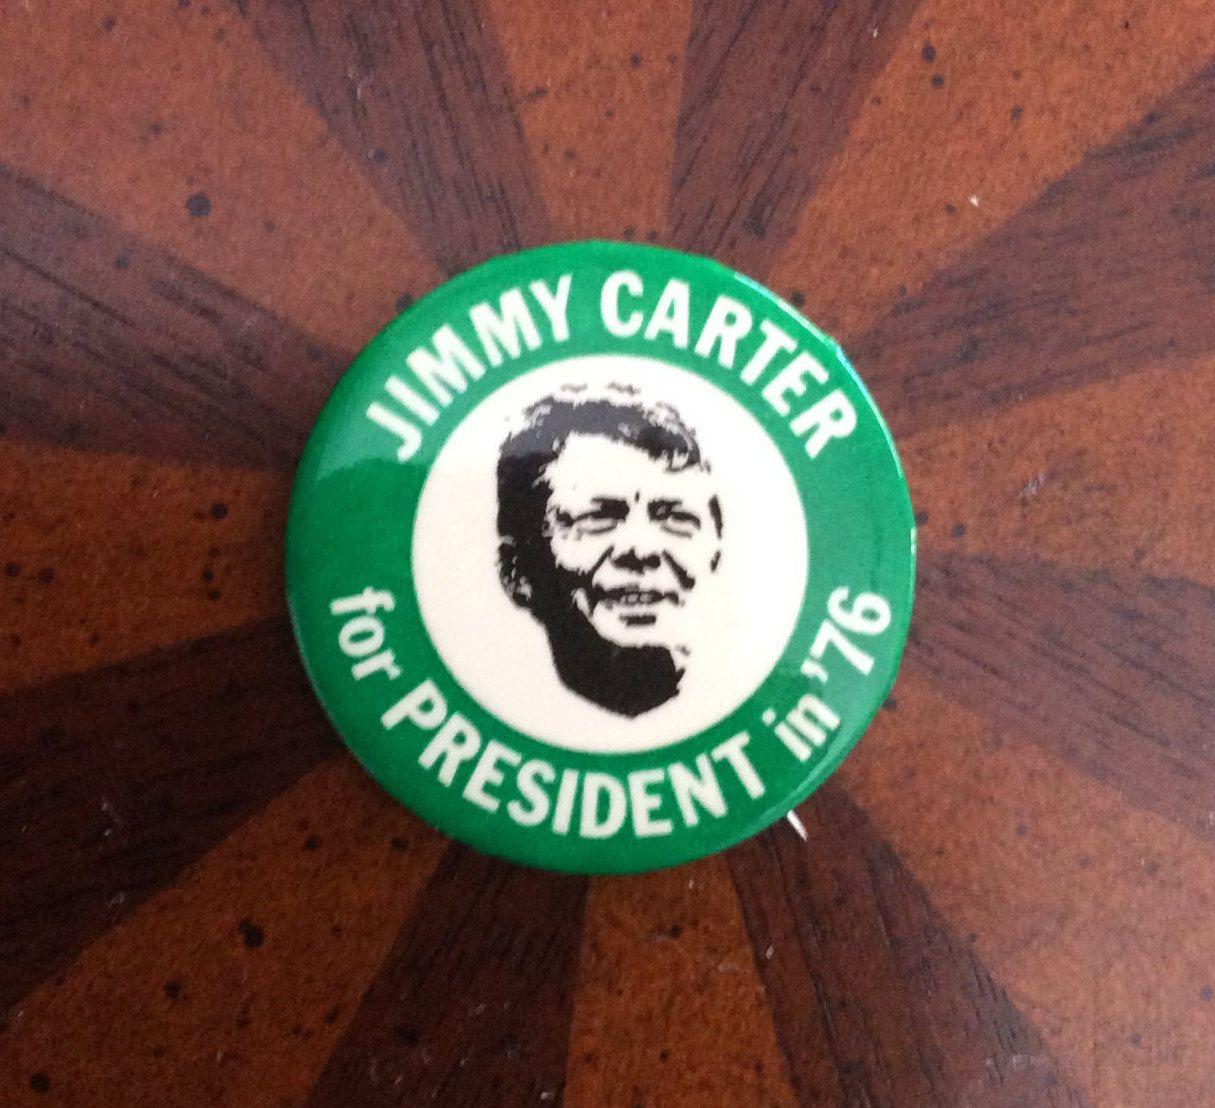 JIMMY CARTERFOR PRESIDENT 1976 PRESIDENTIAL VINTAGE POLITICAL BUTTON PINBACK